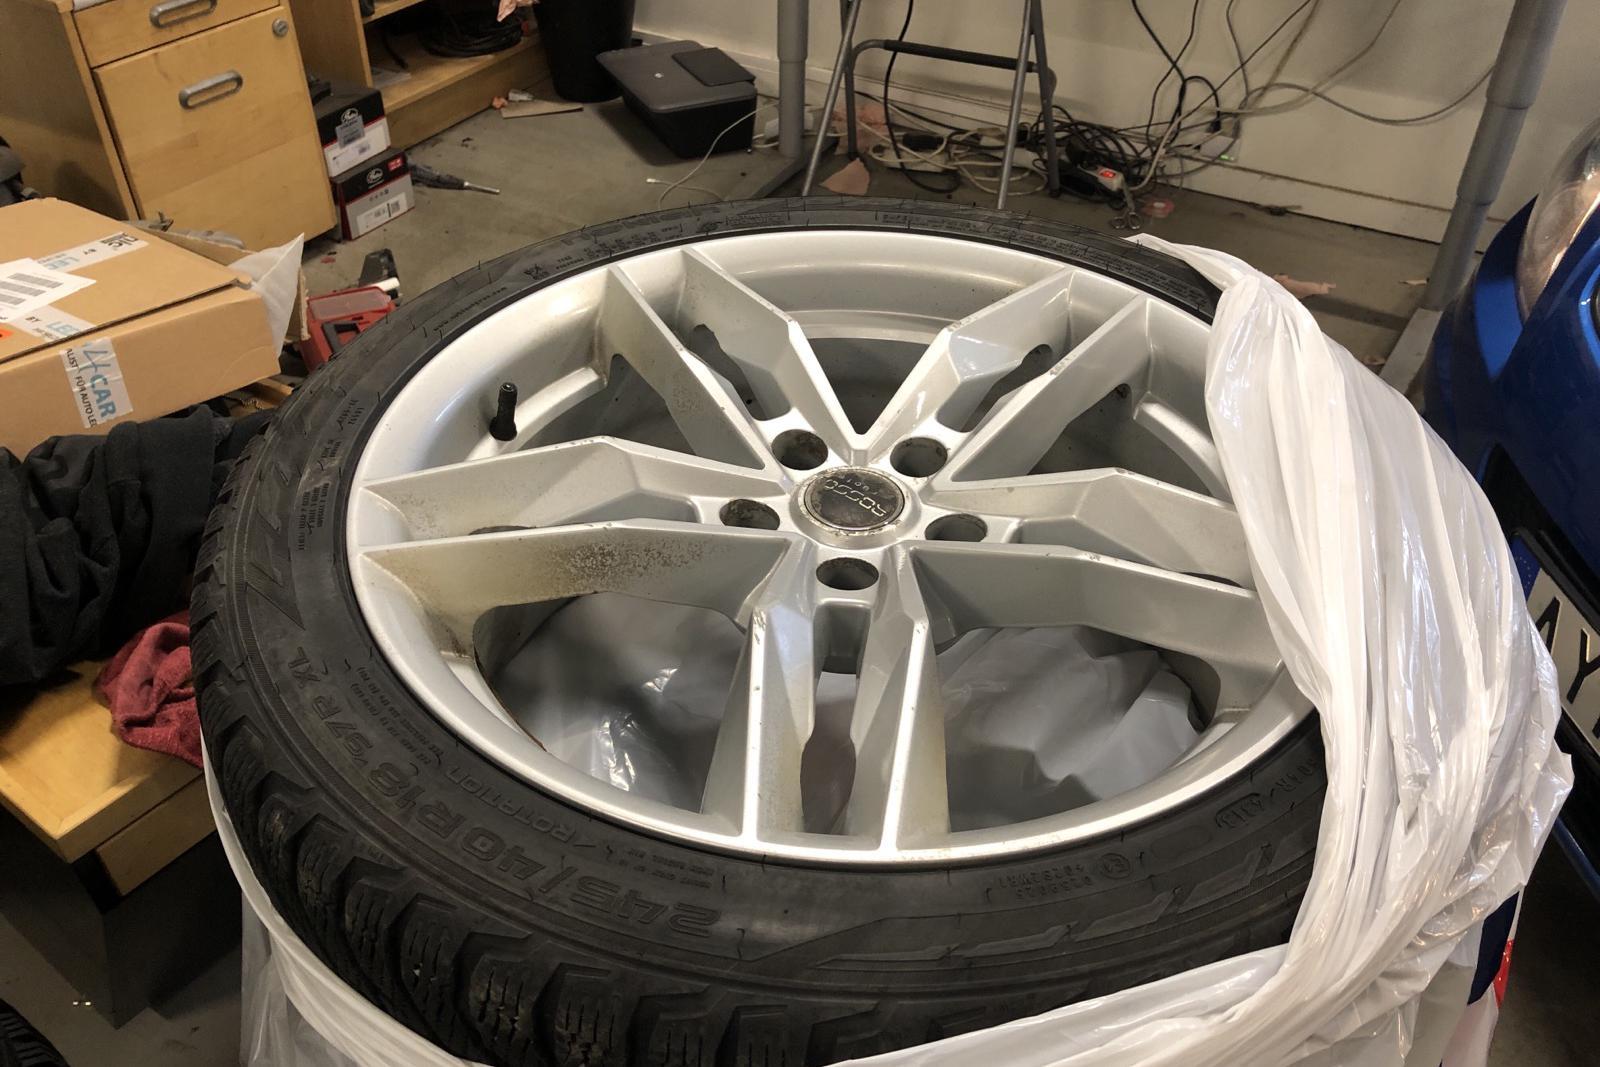 Audi S5 3.0 TFSI Sportback quattro (333hk) - 106 000 km - Automatic - silver - 2013